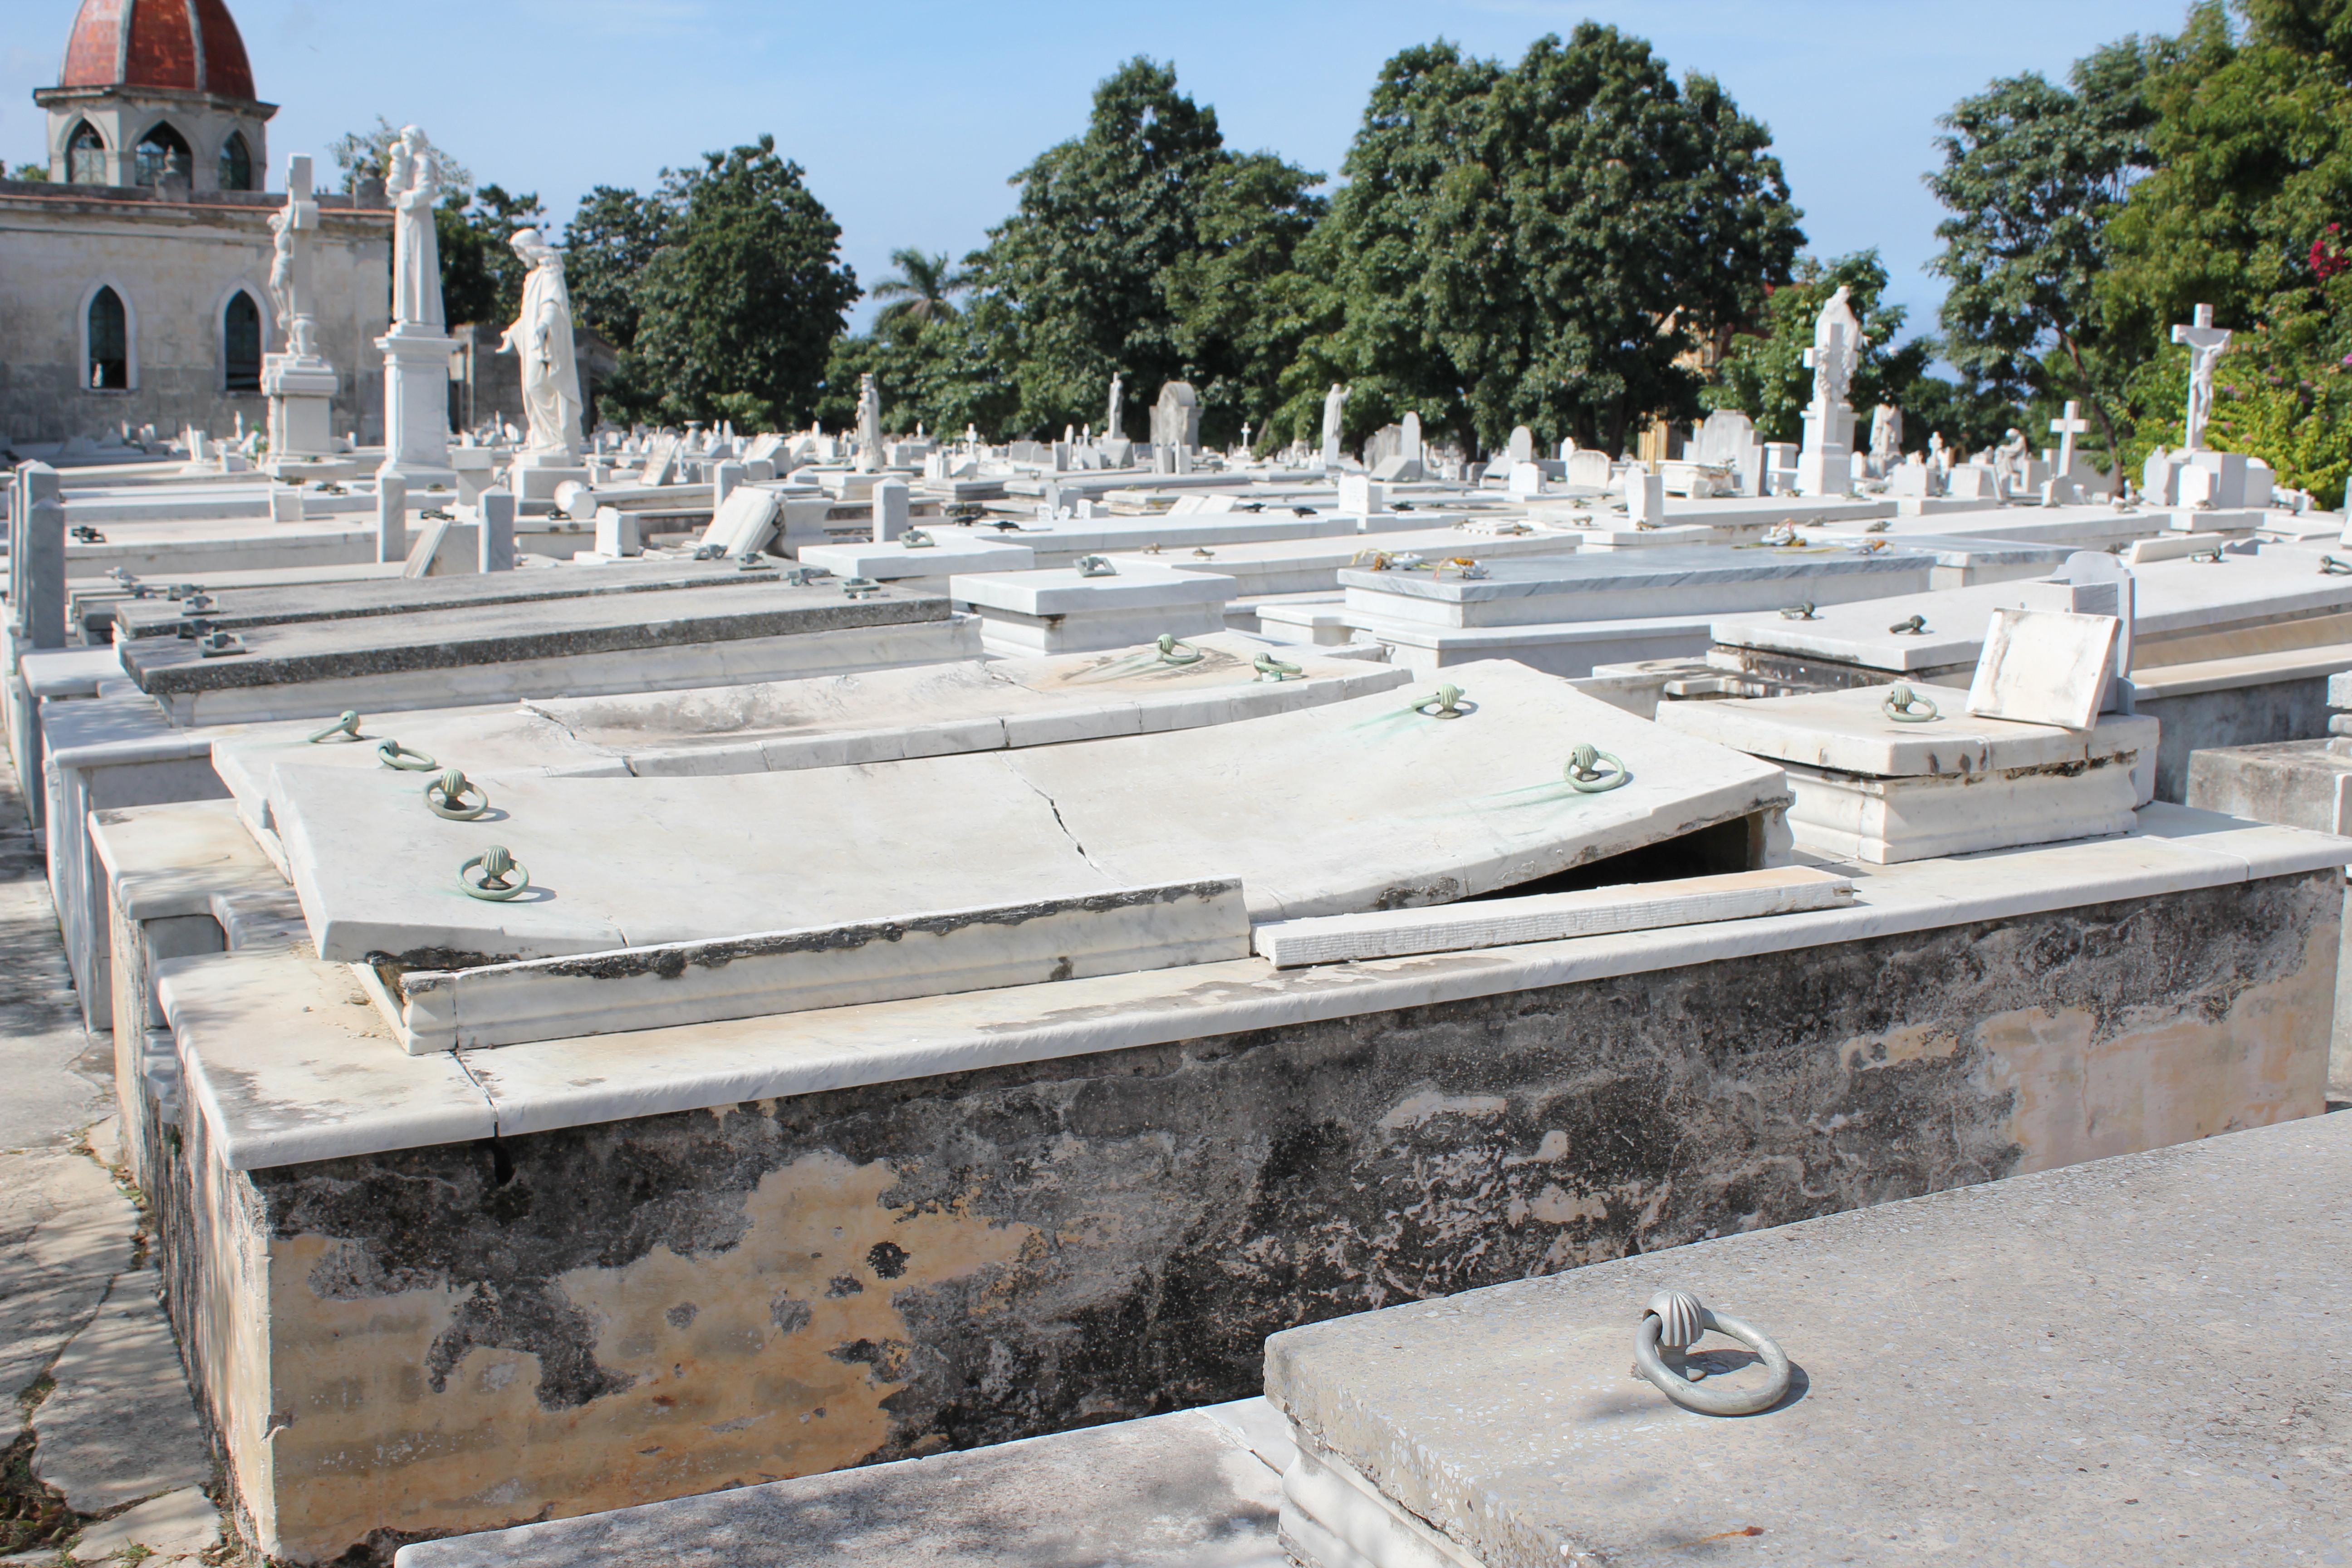 warped_marble_colon_cemetery_havana Havana has cemetery stories, too Cuba